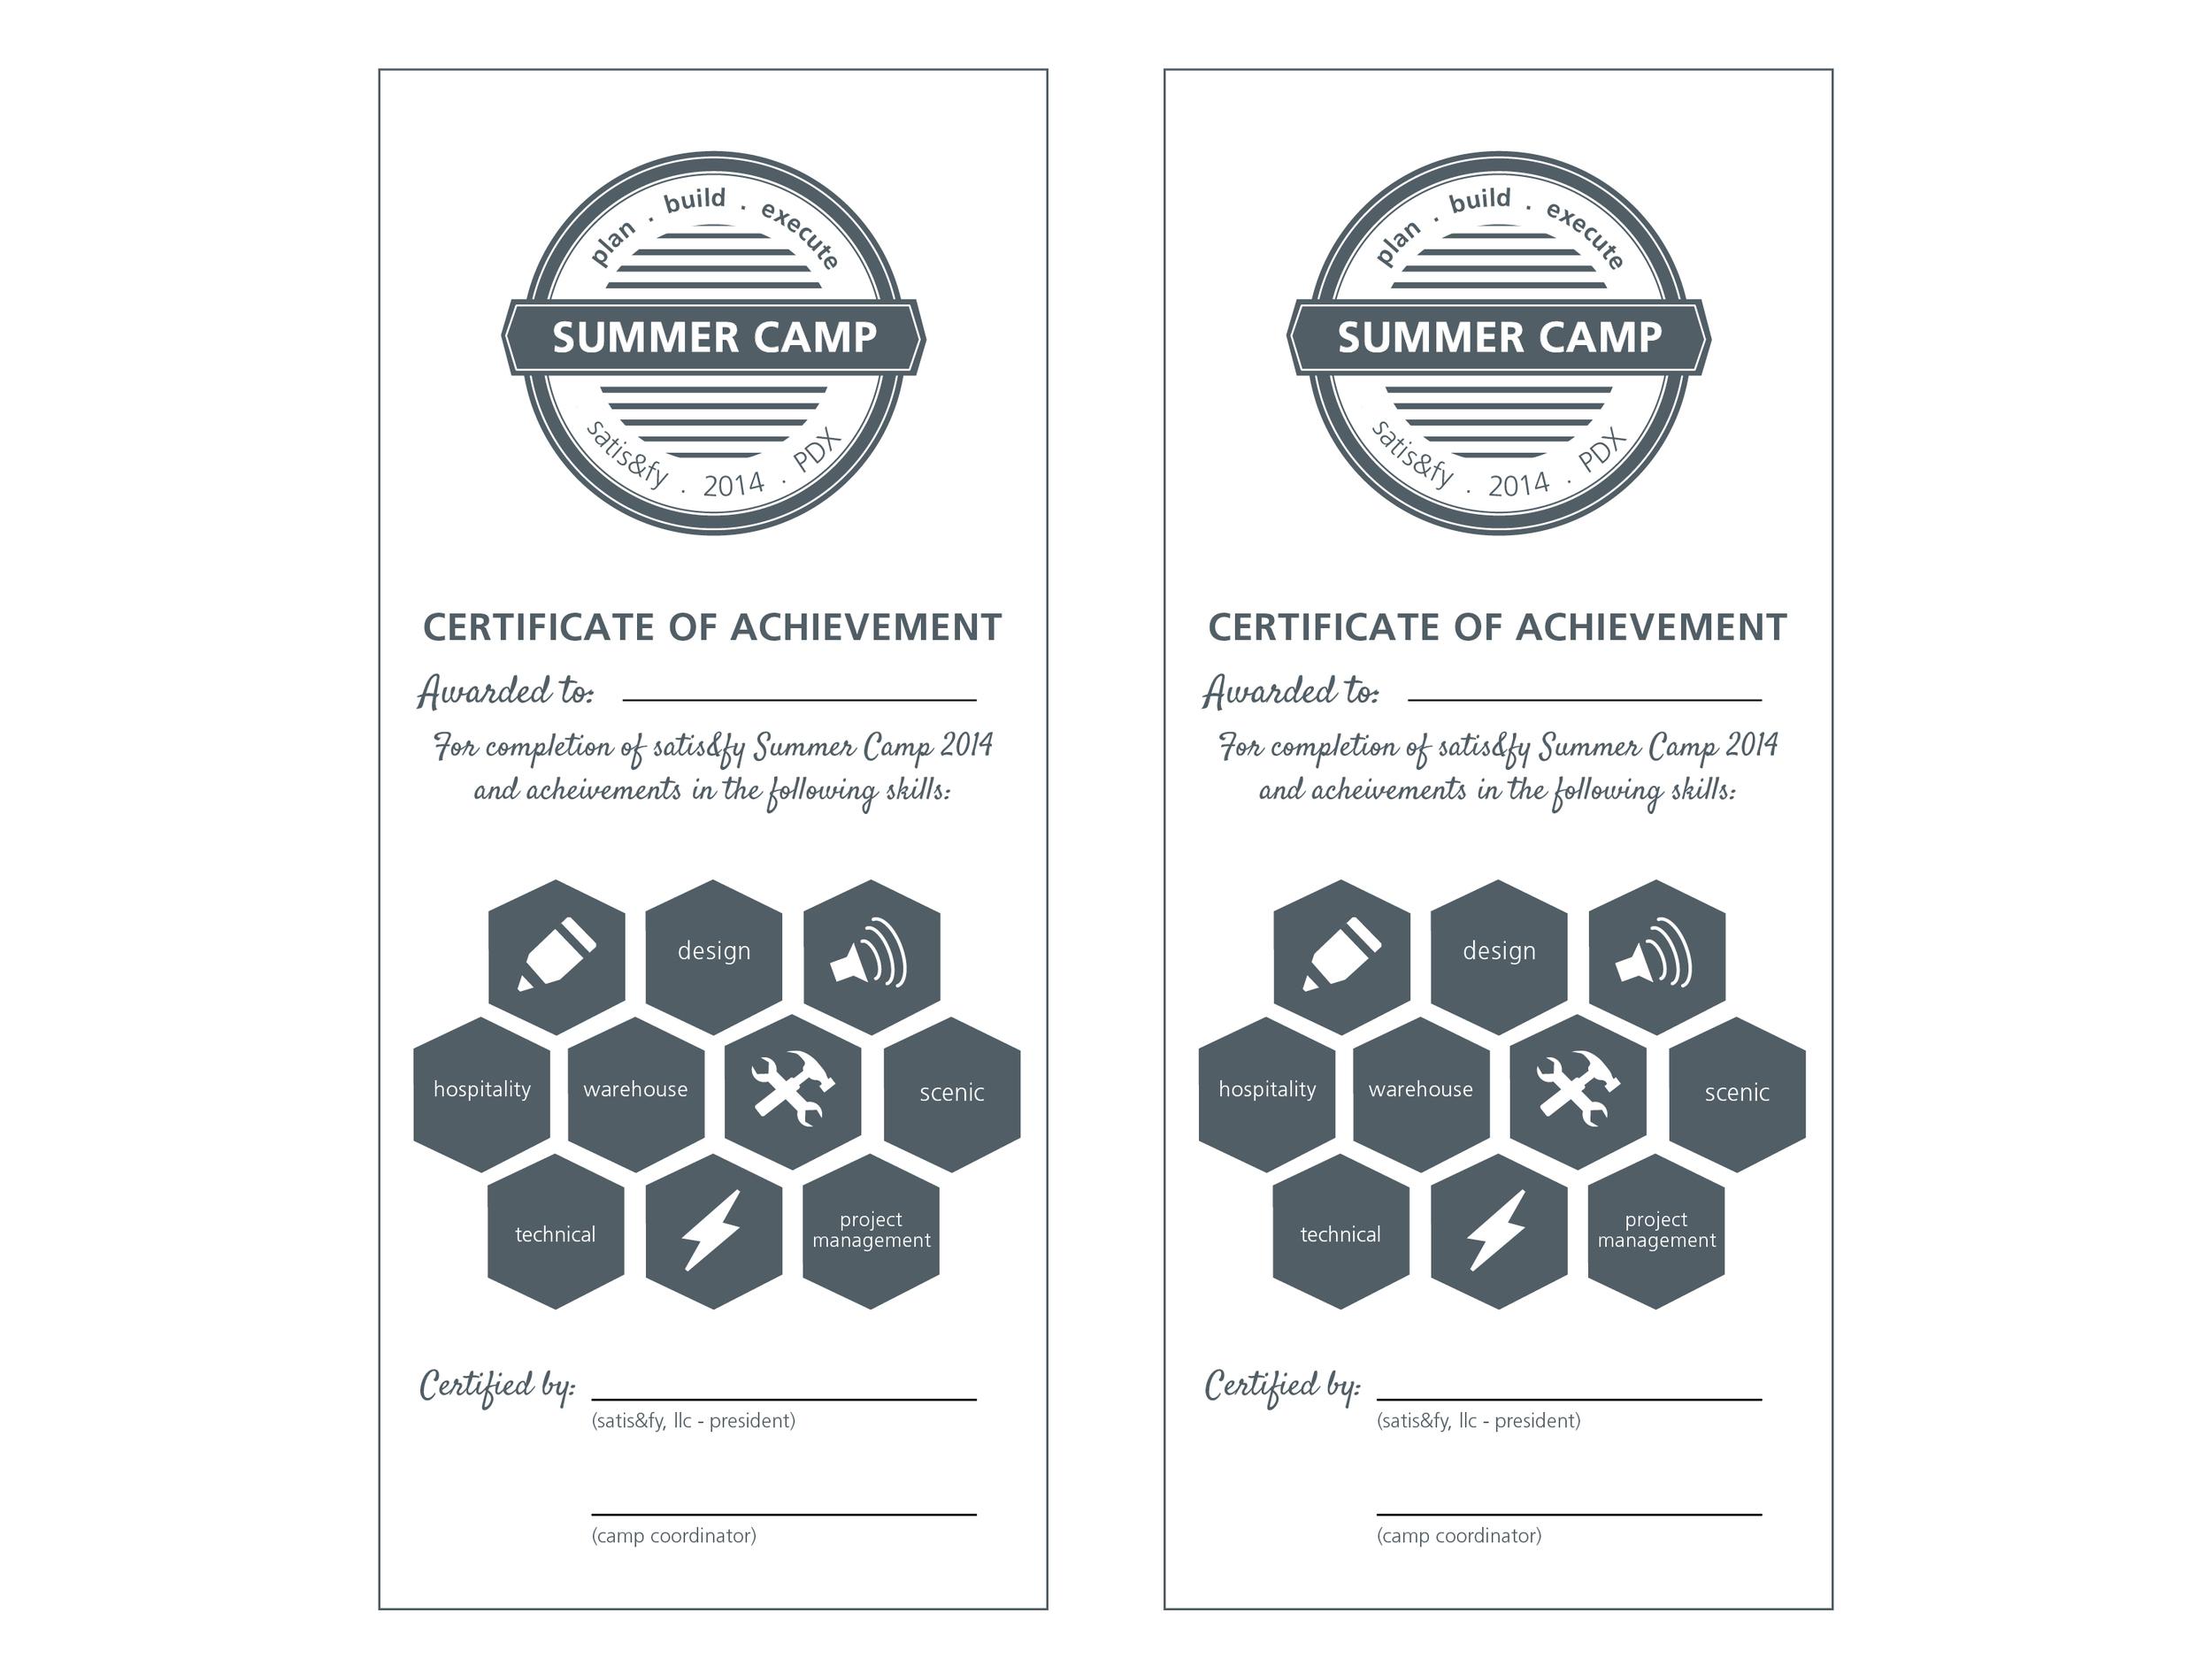 web_summercamp_certificate.jpg